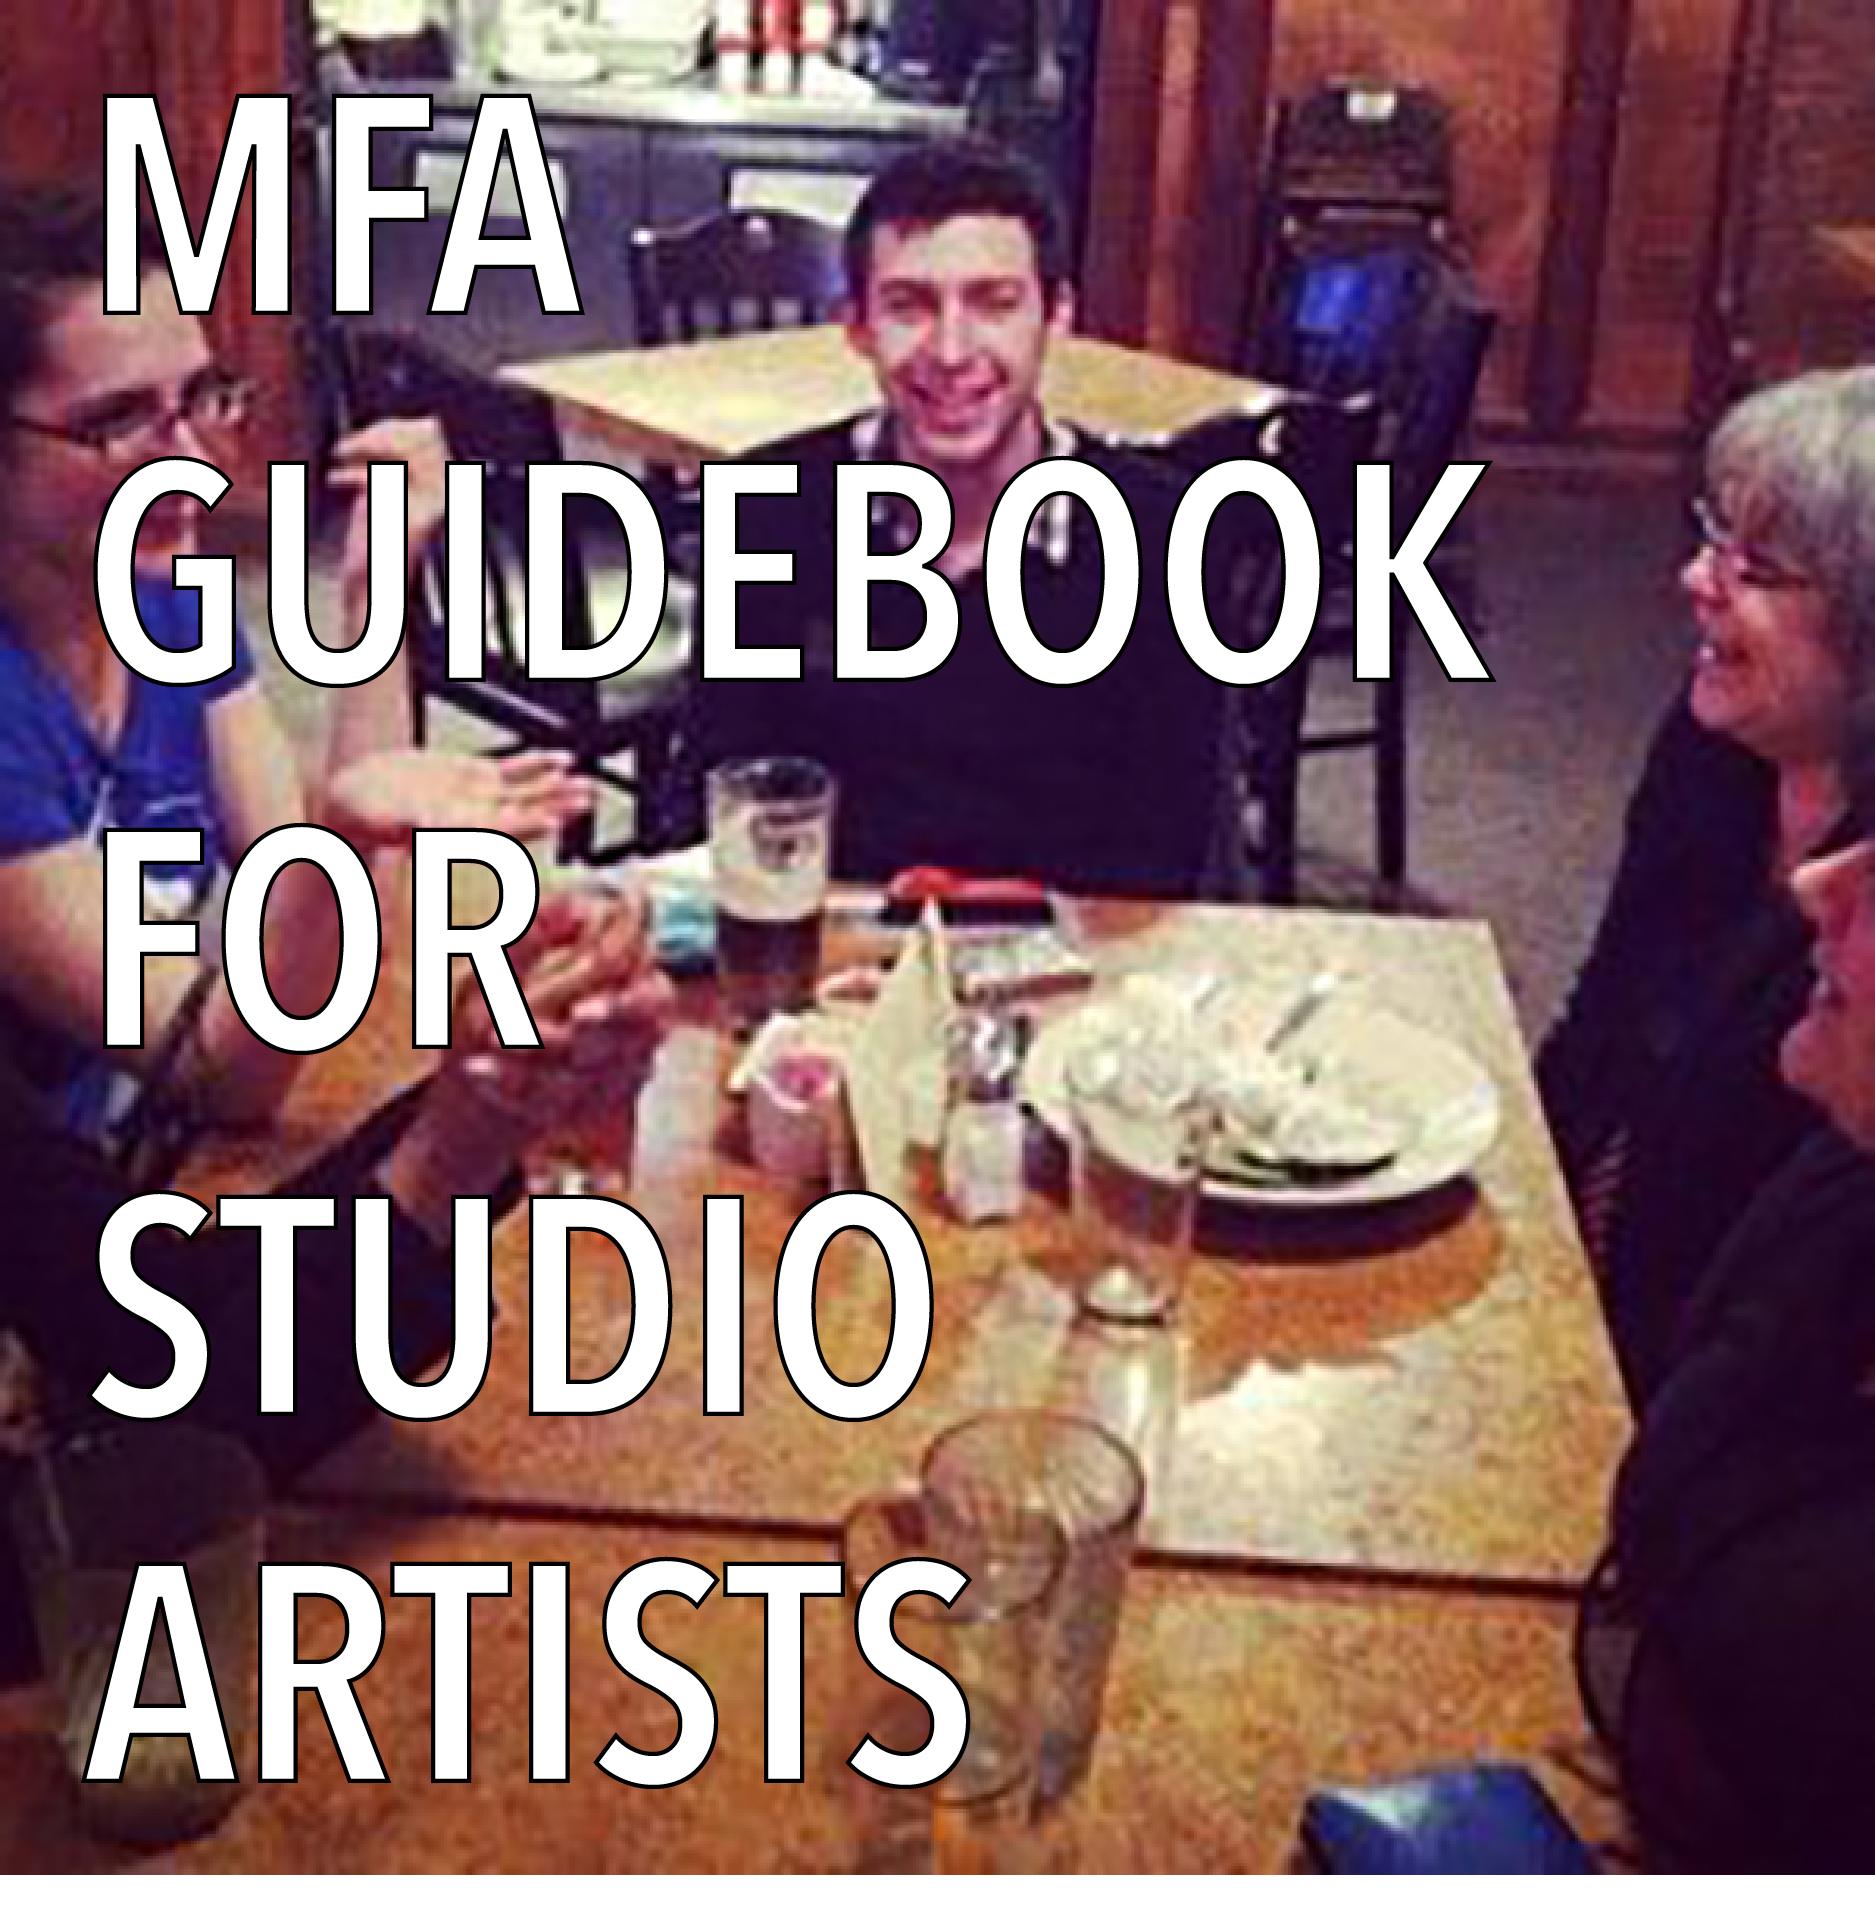 MFA Guidebook thumb.jpg